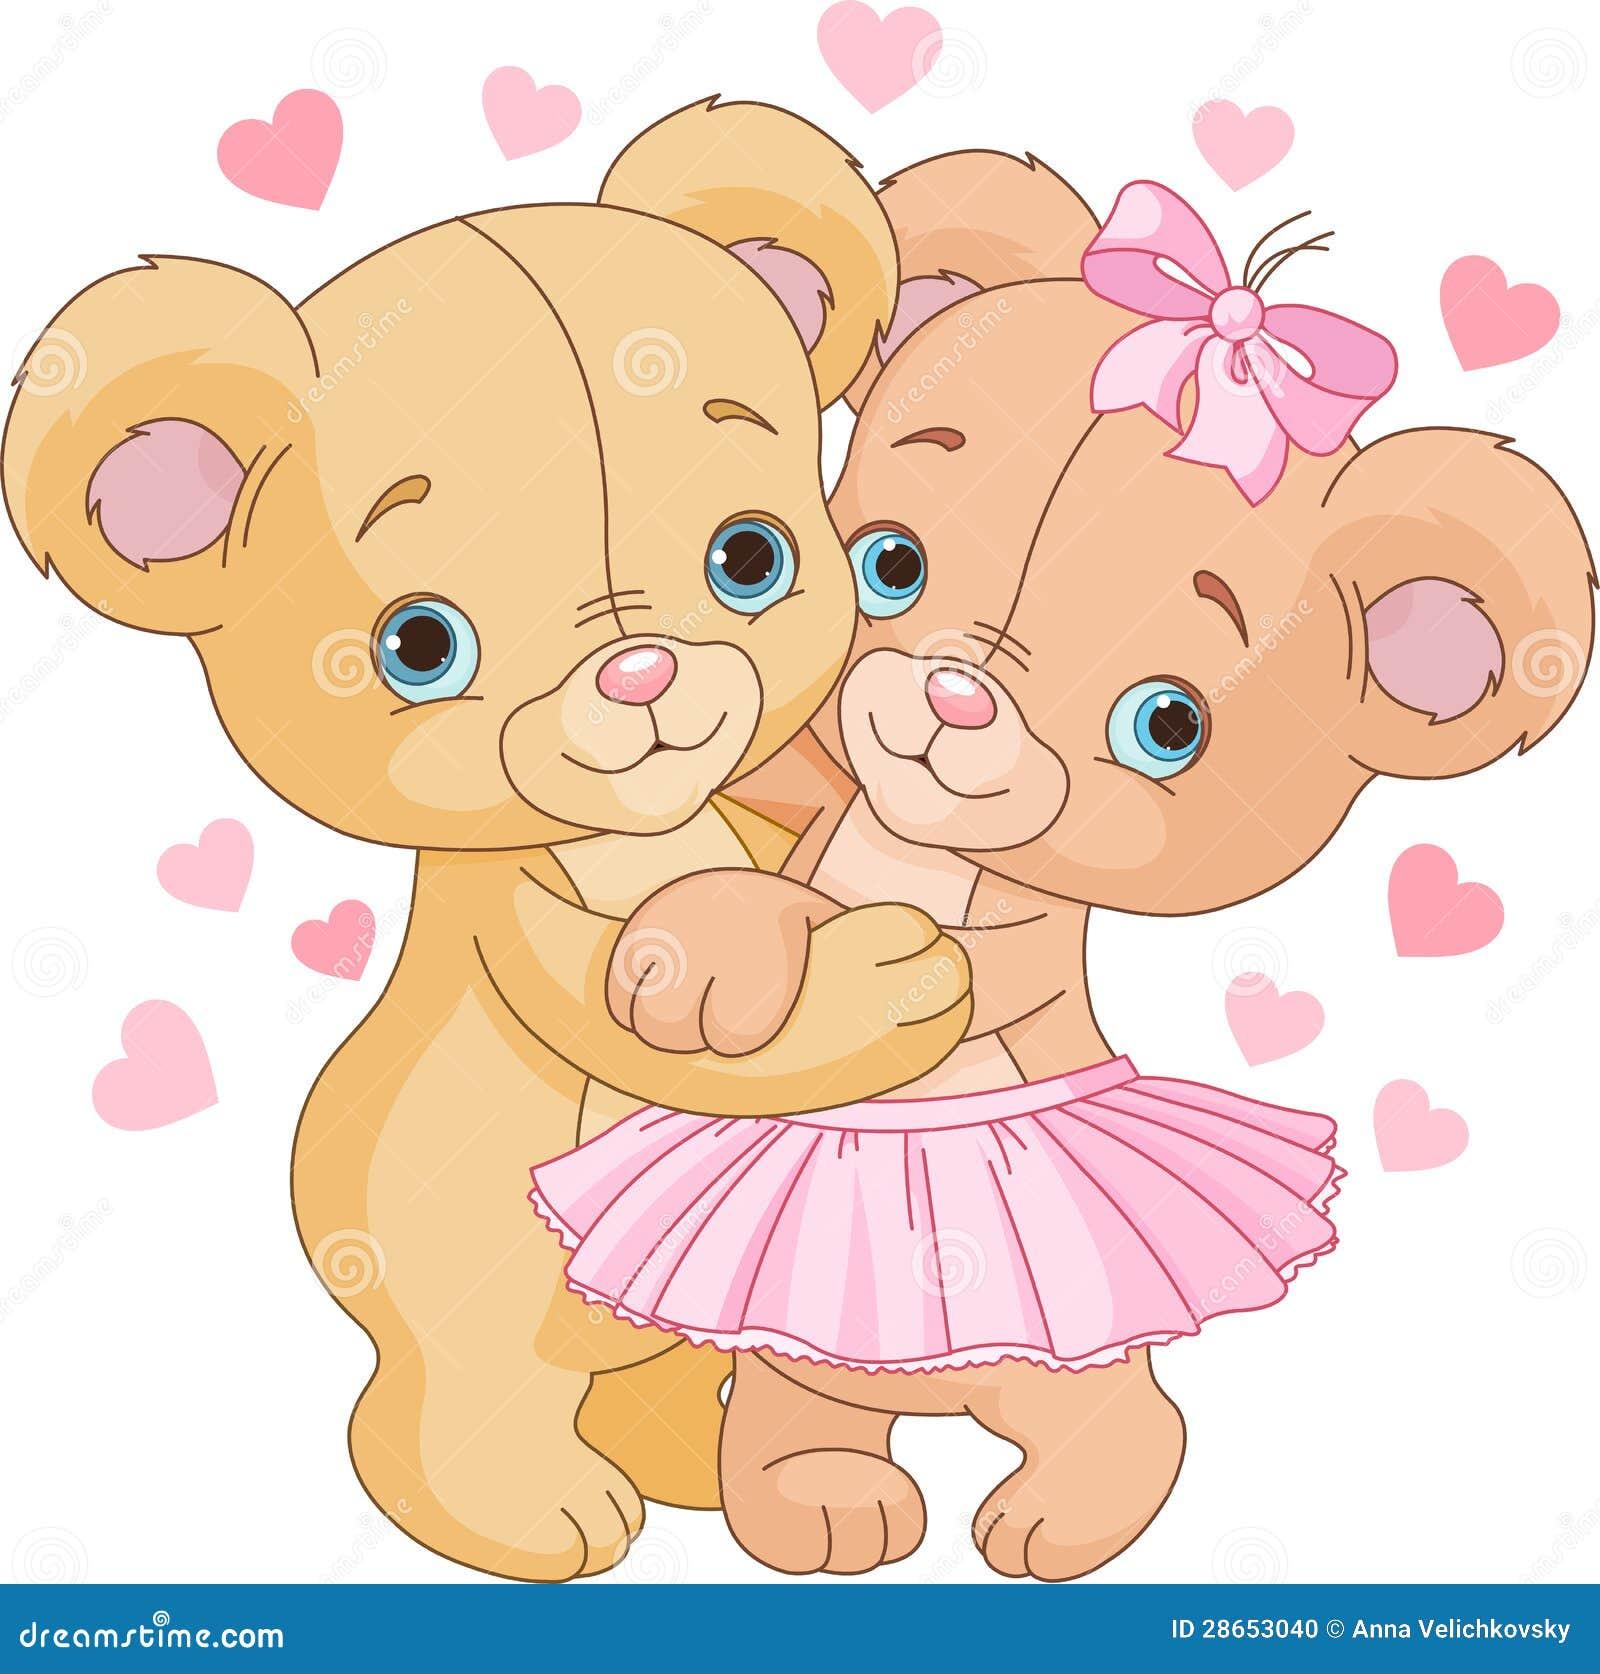 Teddy Bears Images Love Teddy bears in love